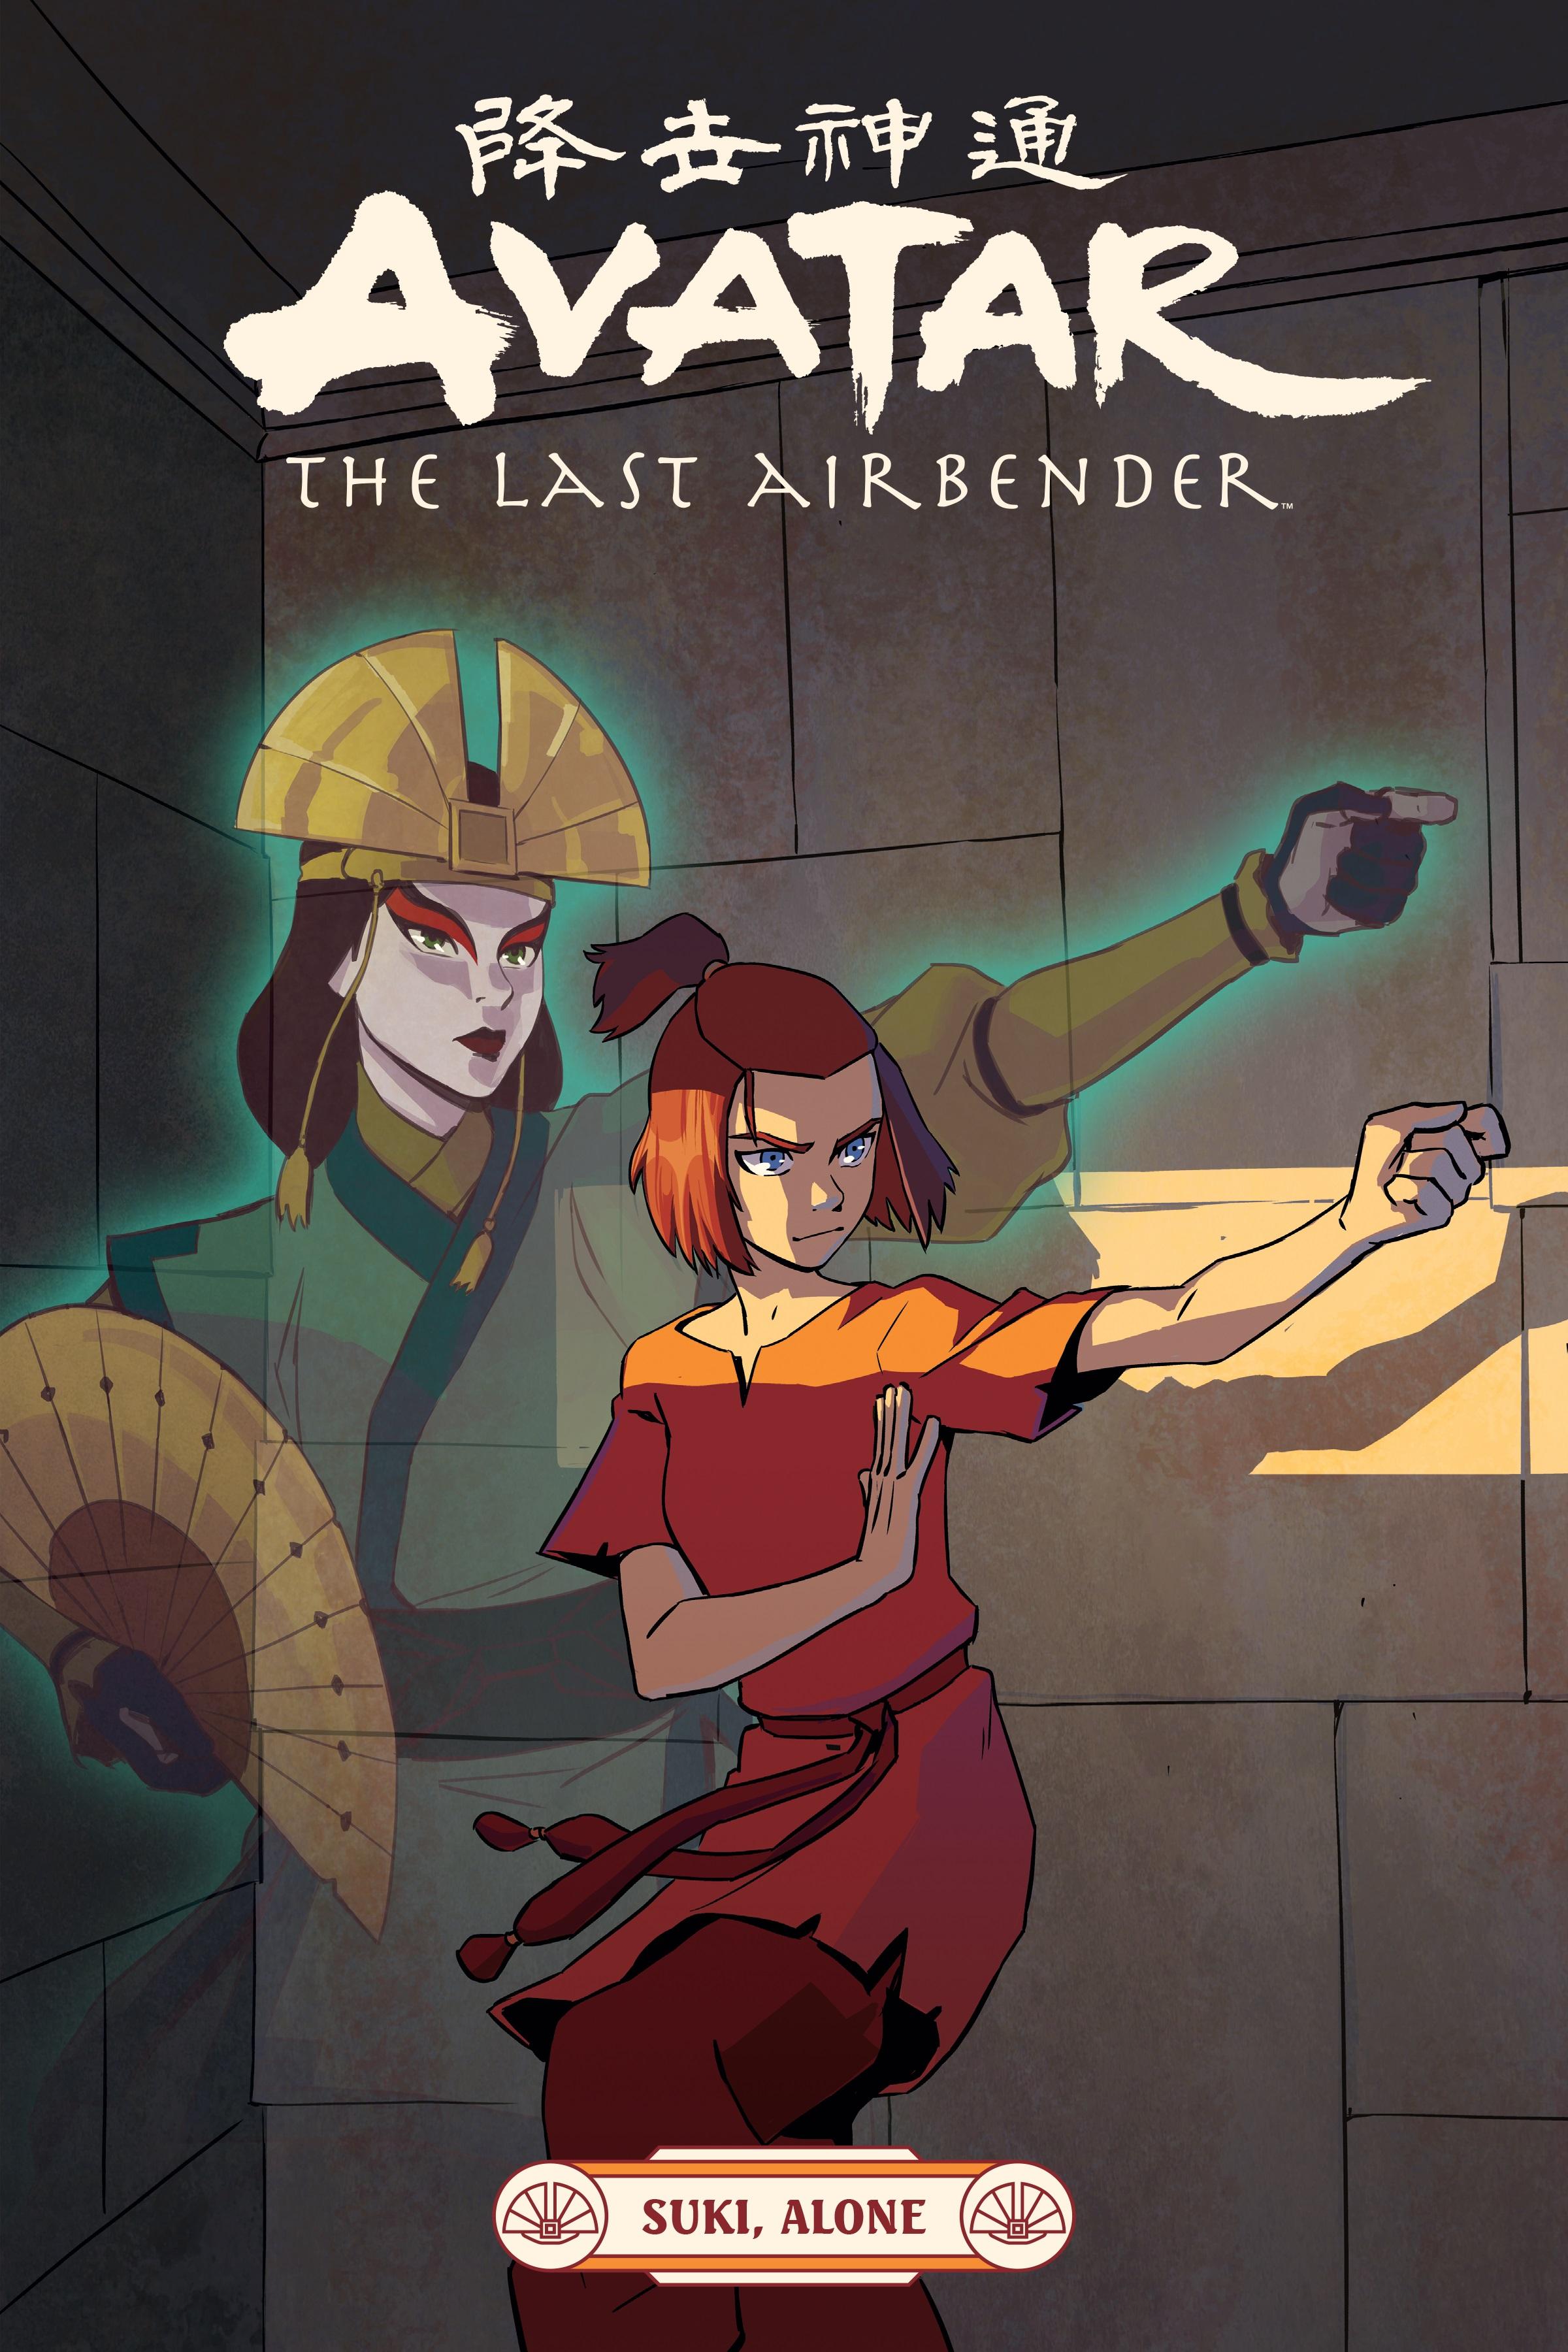 Suki, Alone (Avatar: The Last Airbender, #0.6)